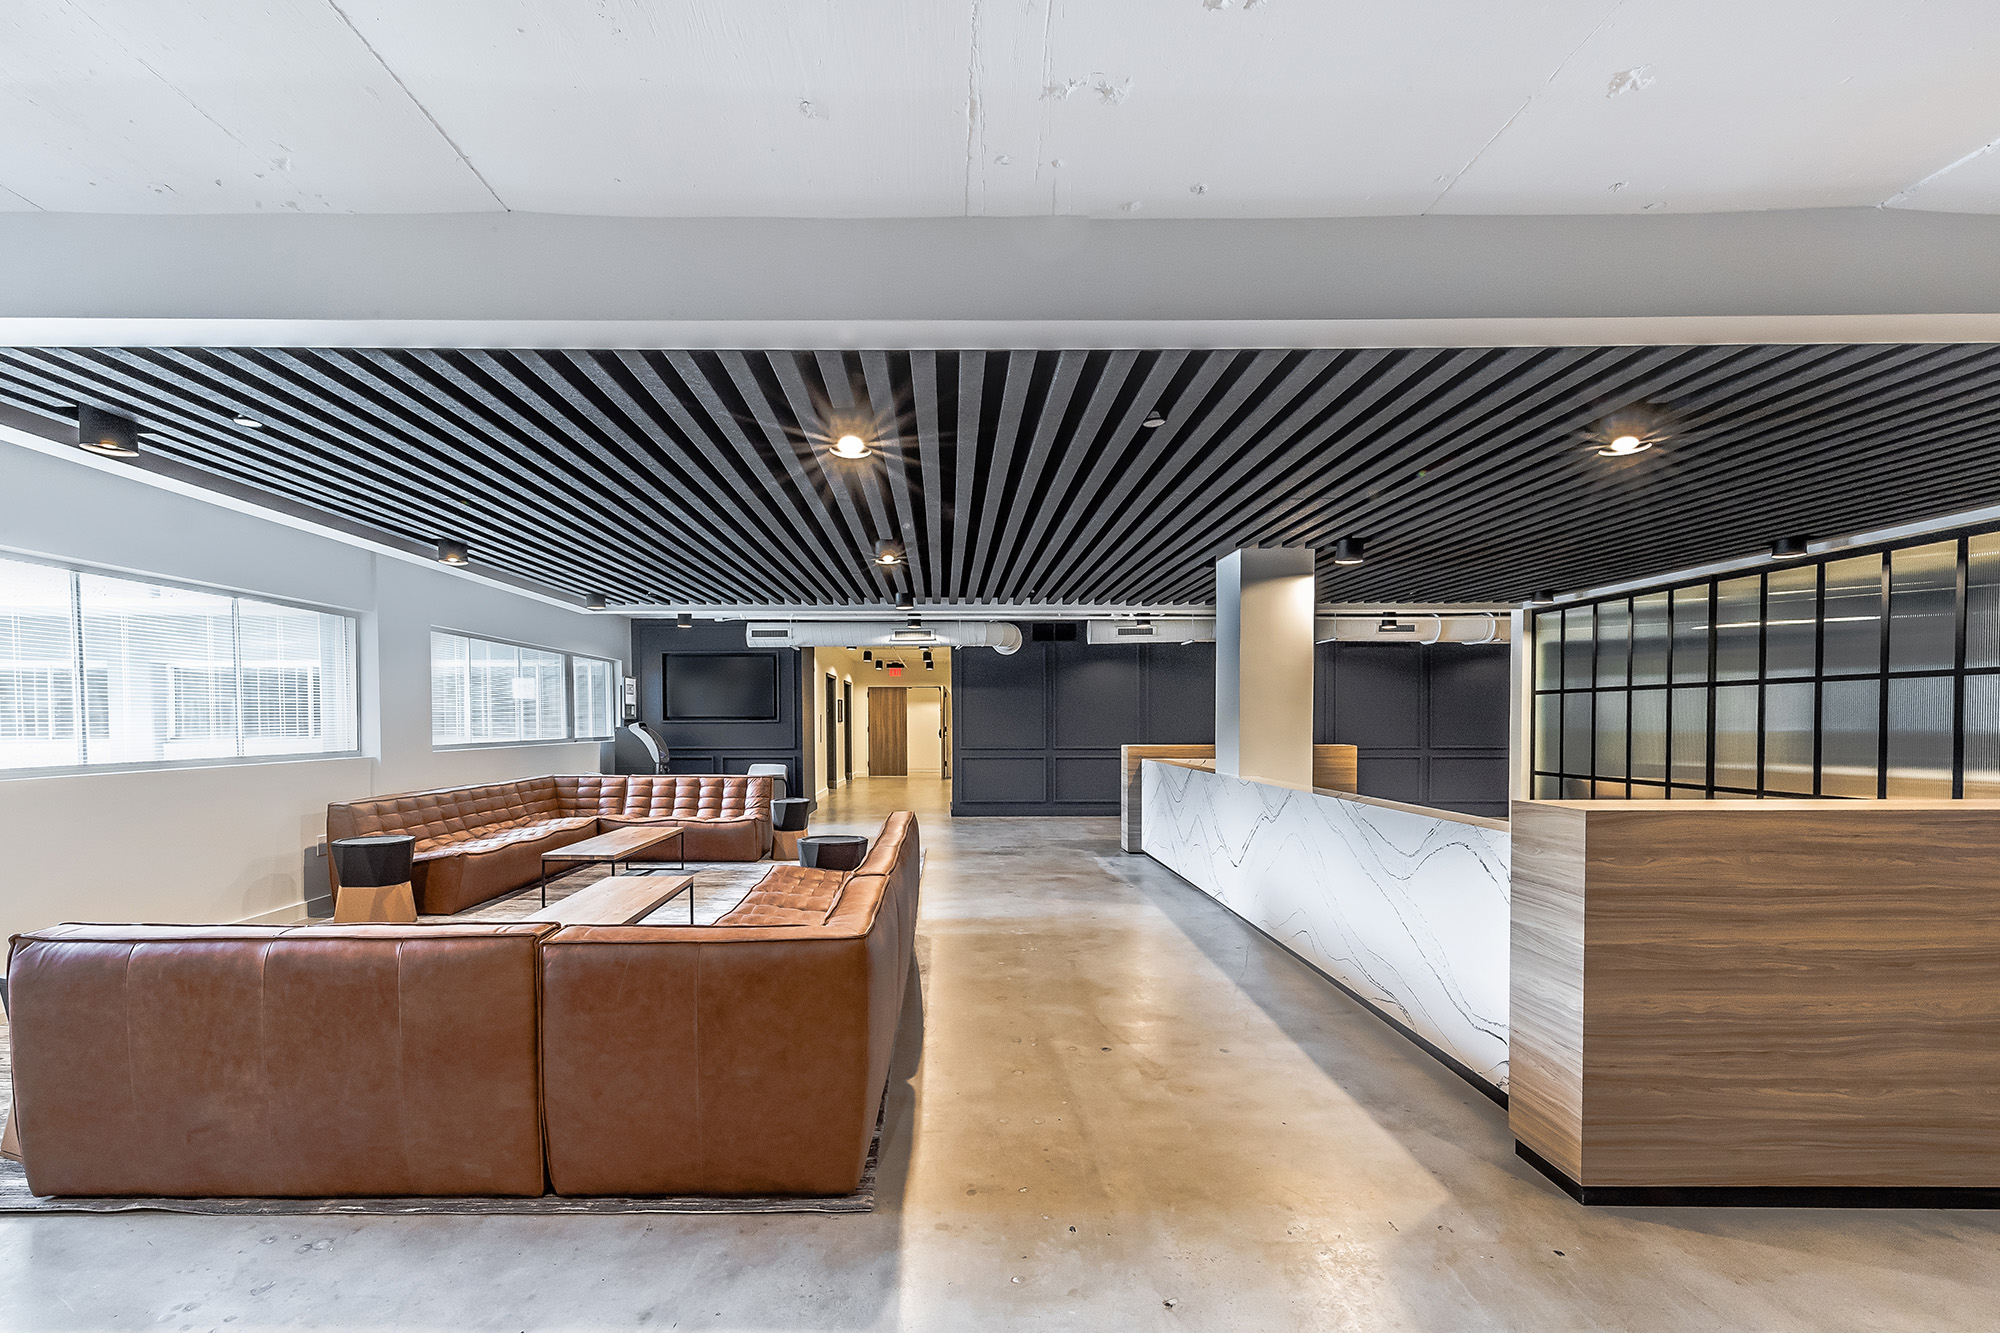 Assets Construction Portfolio: Georgia Banking Company